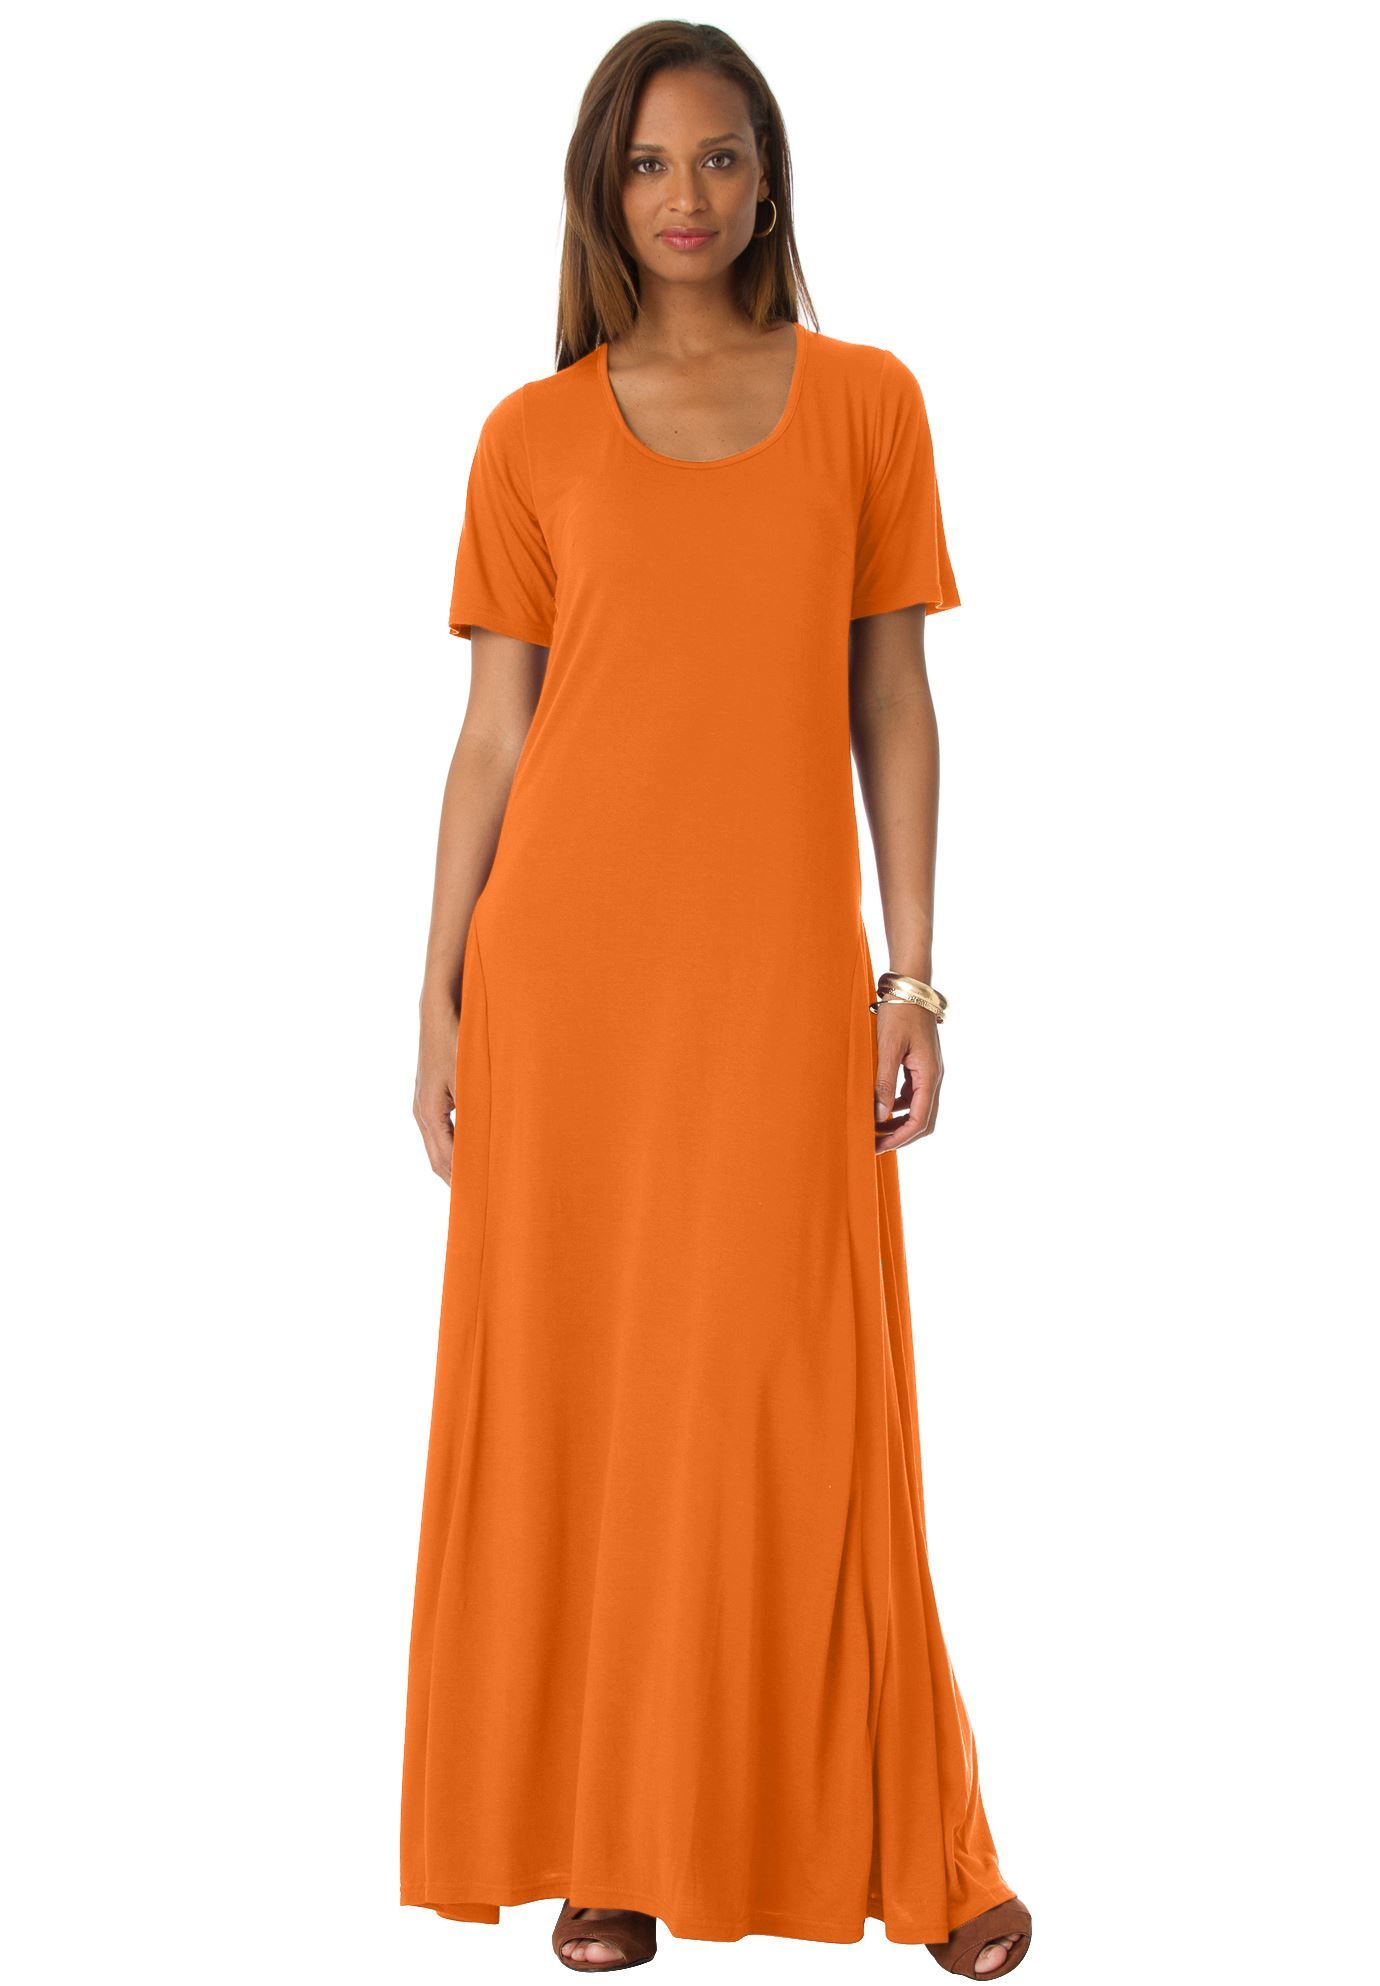 def0a18c3a1 Jessica London® Tee Shirt Maxi Dress